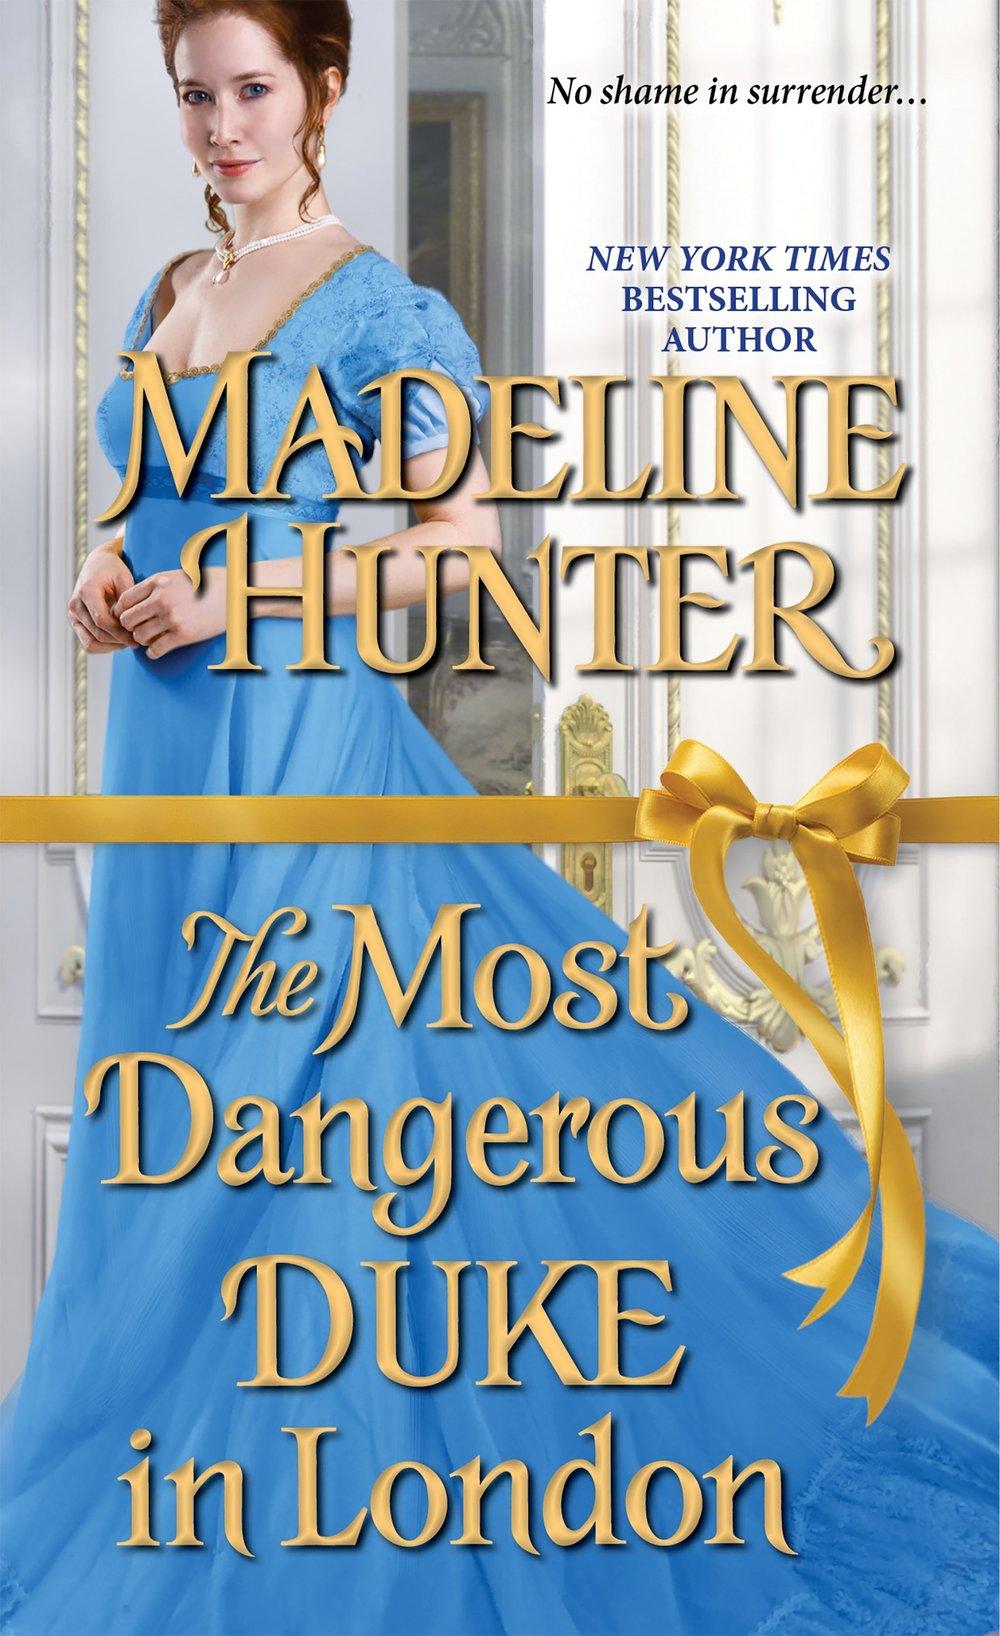 The Most Dangerous Duke in London , by Madeline Hunter